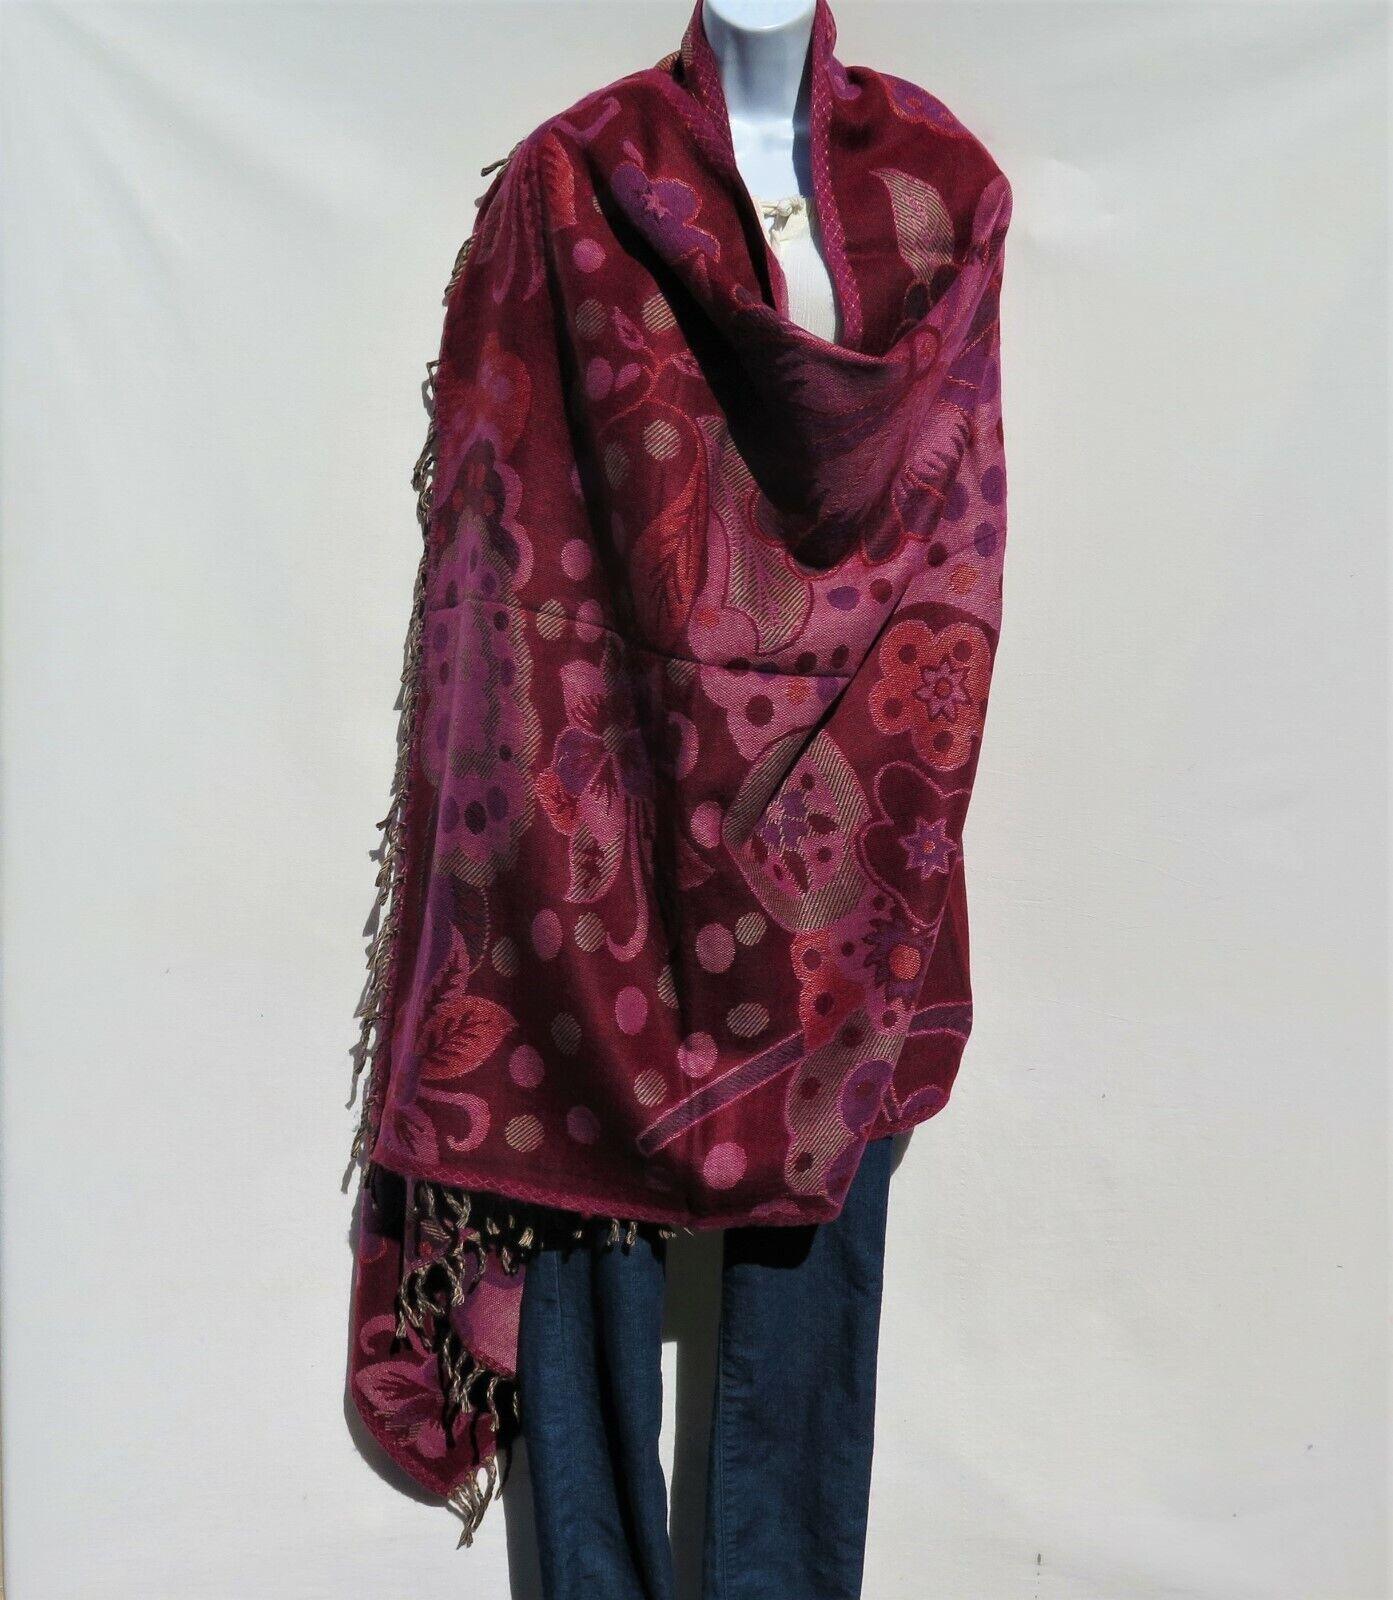 Yak+Sheep Wool Flora Shawl Throw Wrap  Handloomed Reversal Base color  Plum